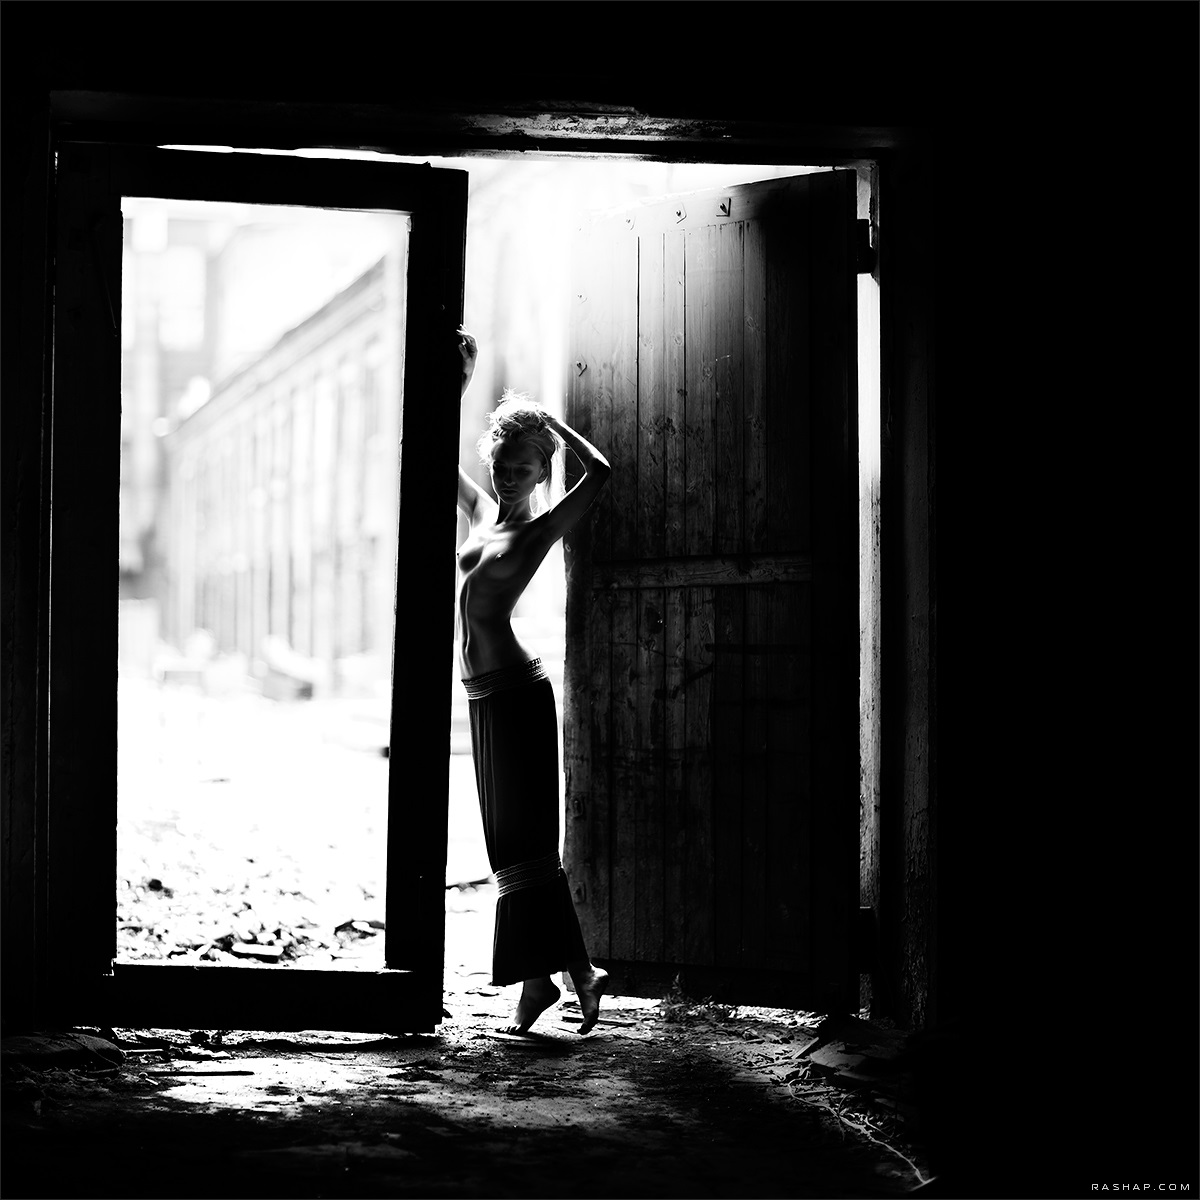 Charming black & white pictures by a photographer Ilya Rashap - 17